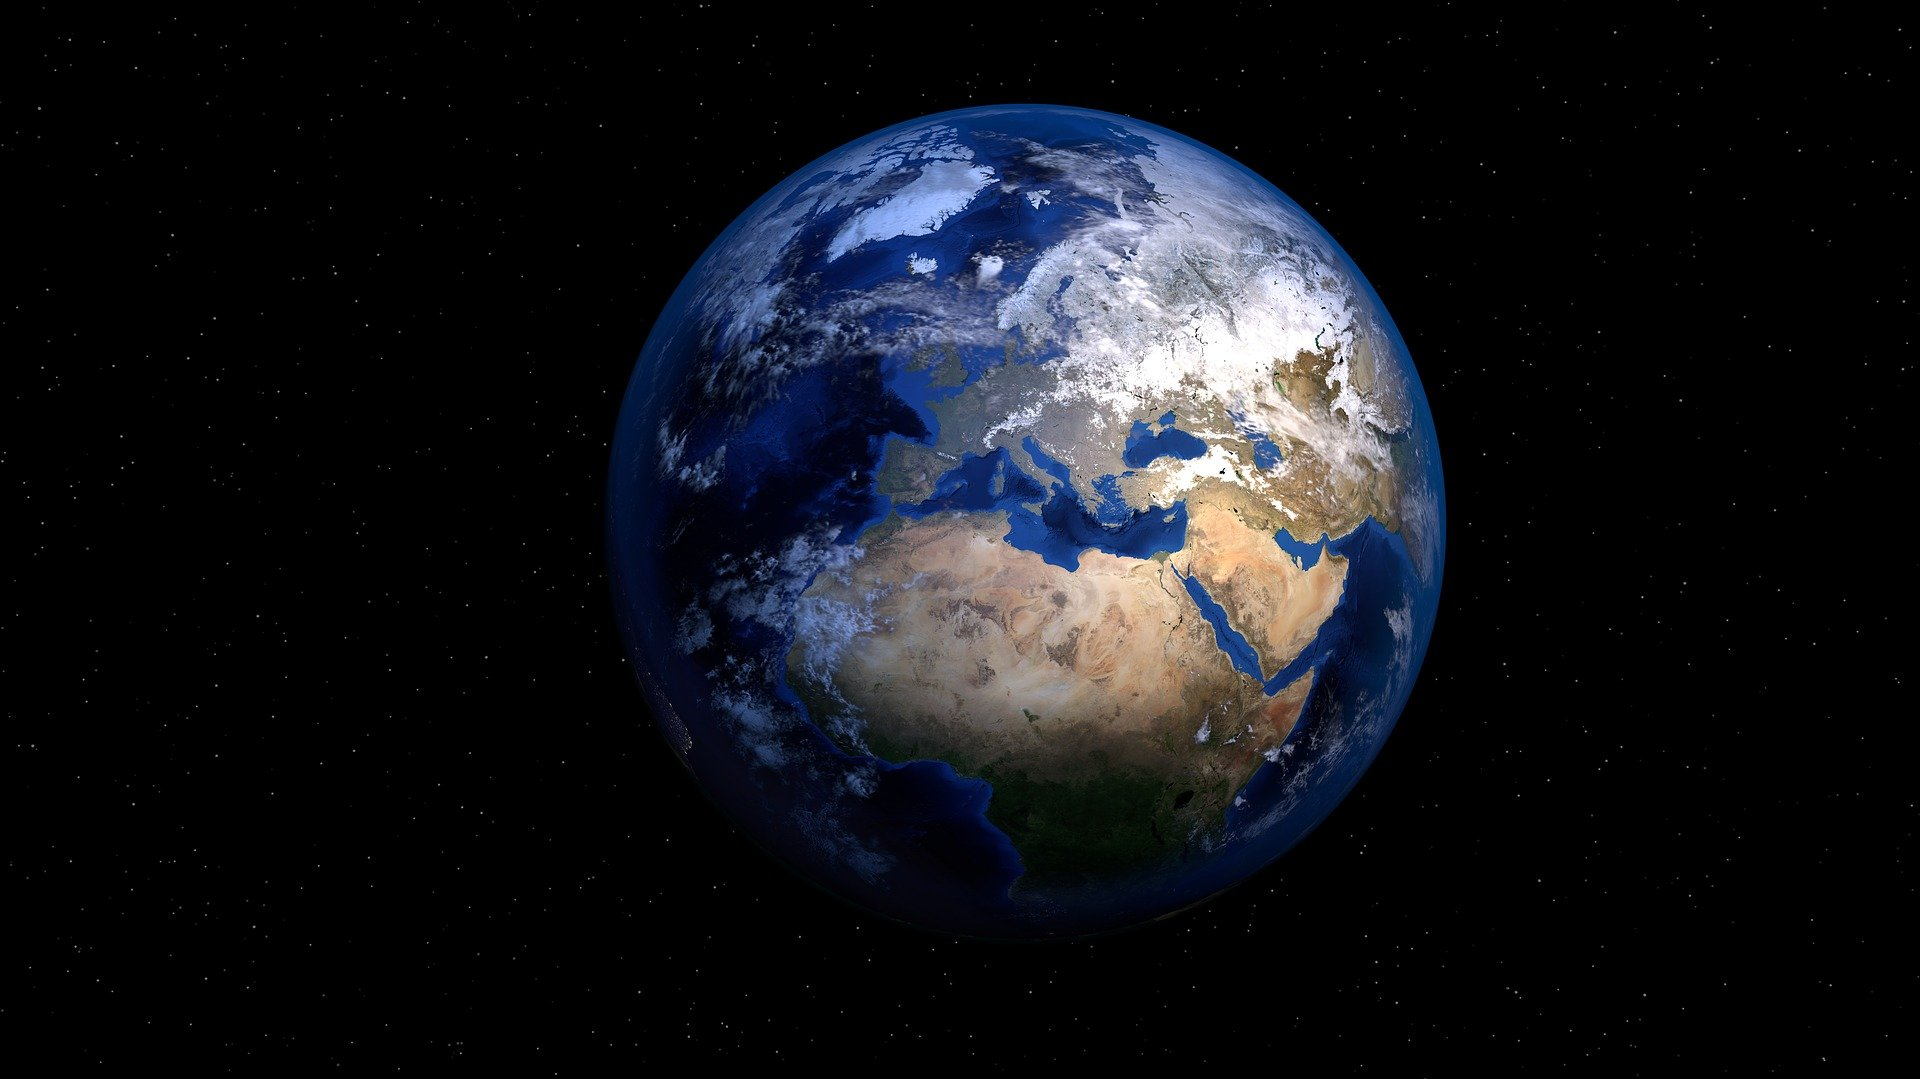 Der Planet Erde aus dem All betrachtet